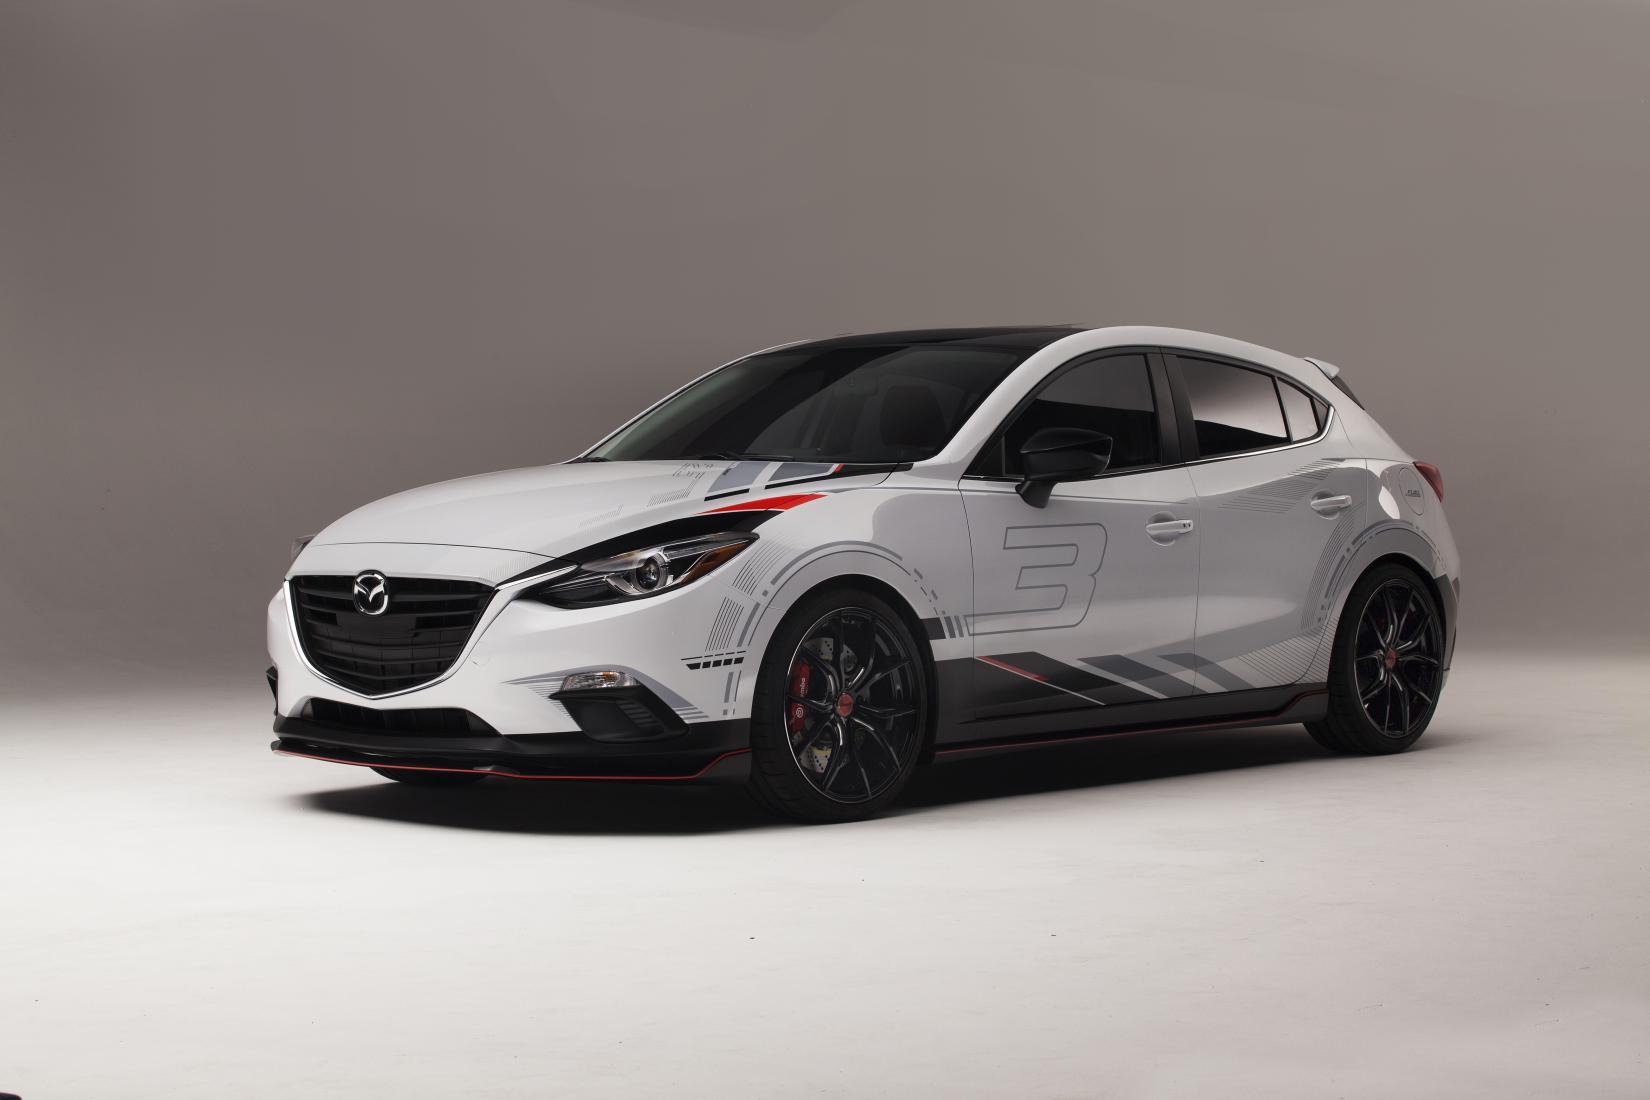 Build A Toyota >> Mazda3 and Mazda6 2013 SEMA Concepts Revealed - autoevolution